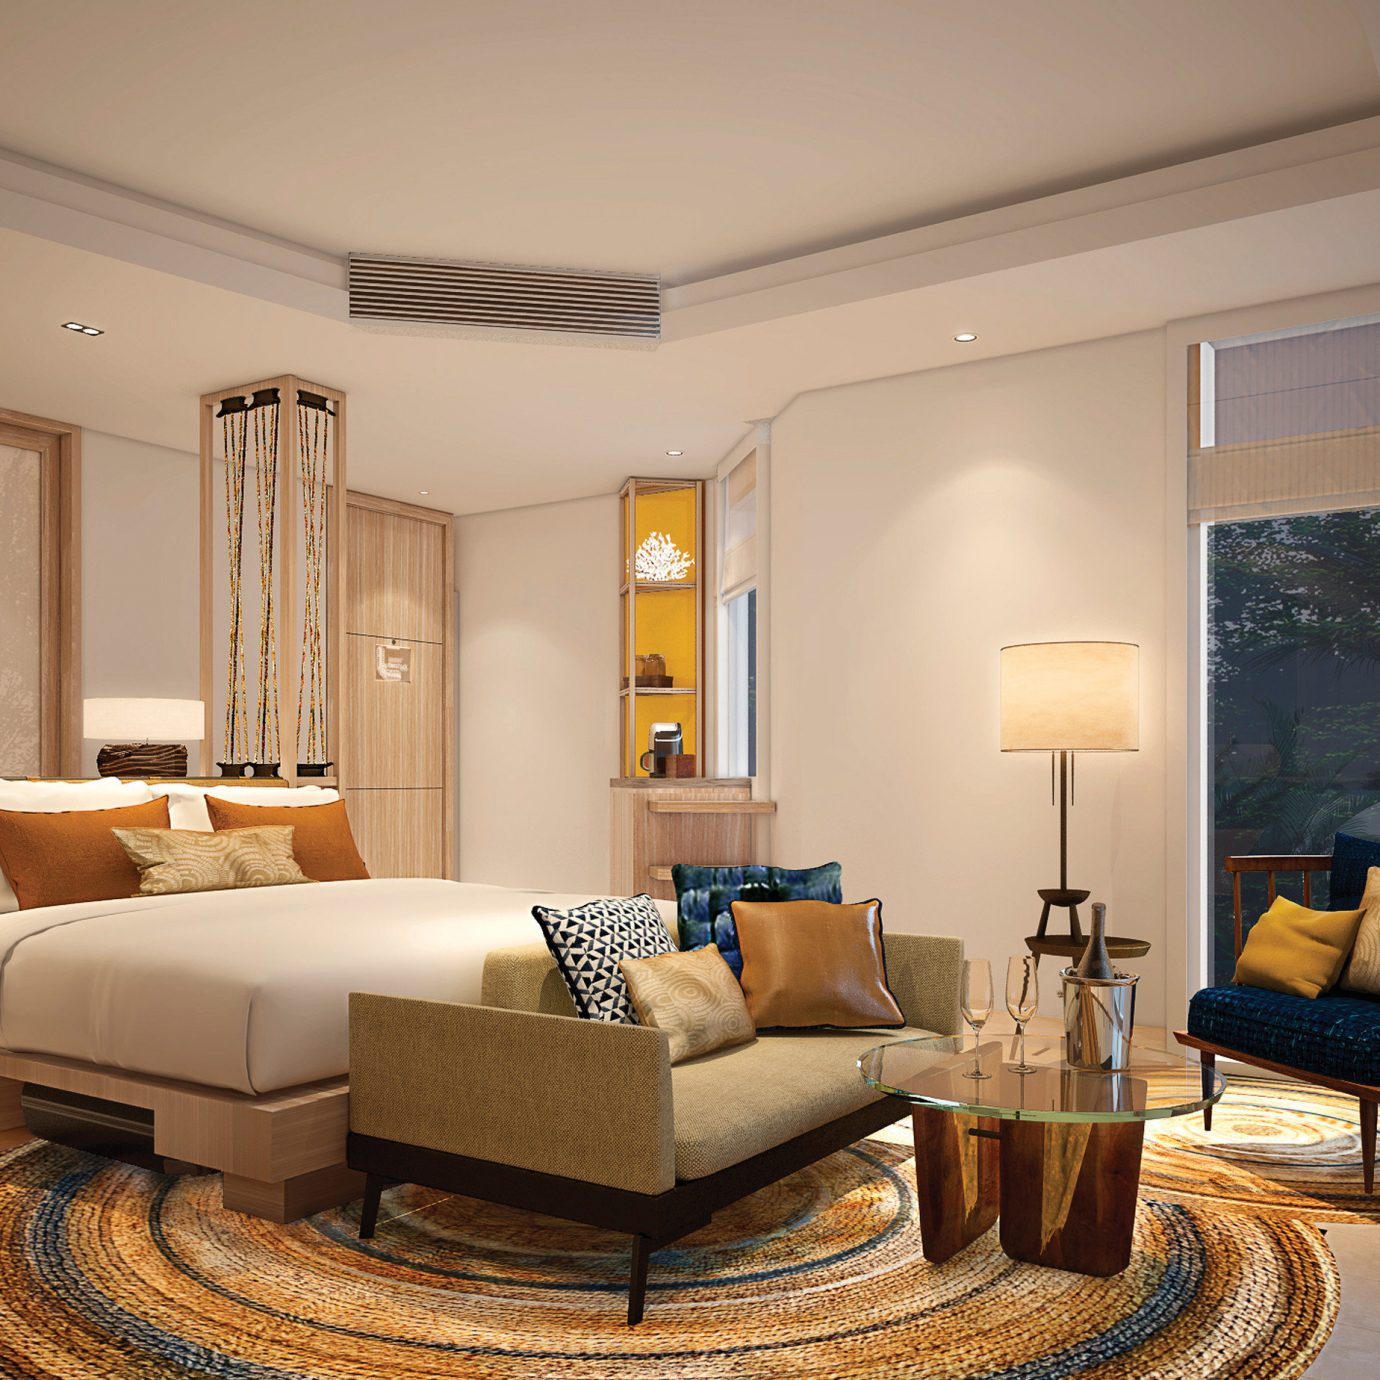 living room property home hardwood Suite mansion Villa condominium cottage Bedroom